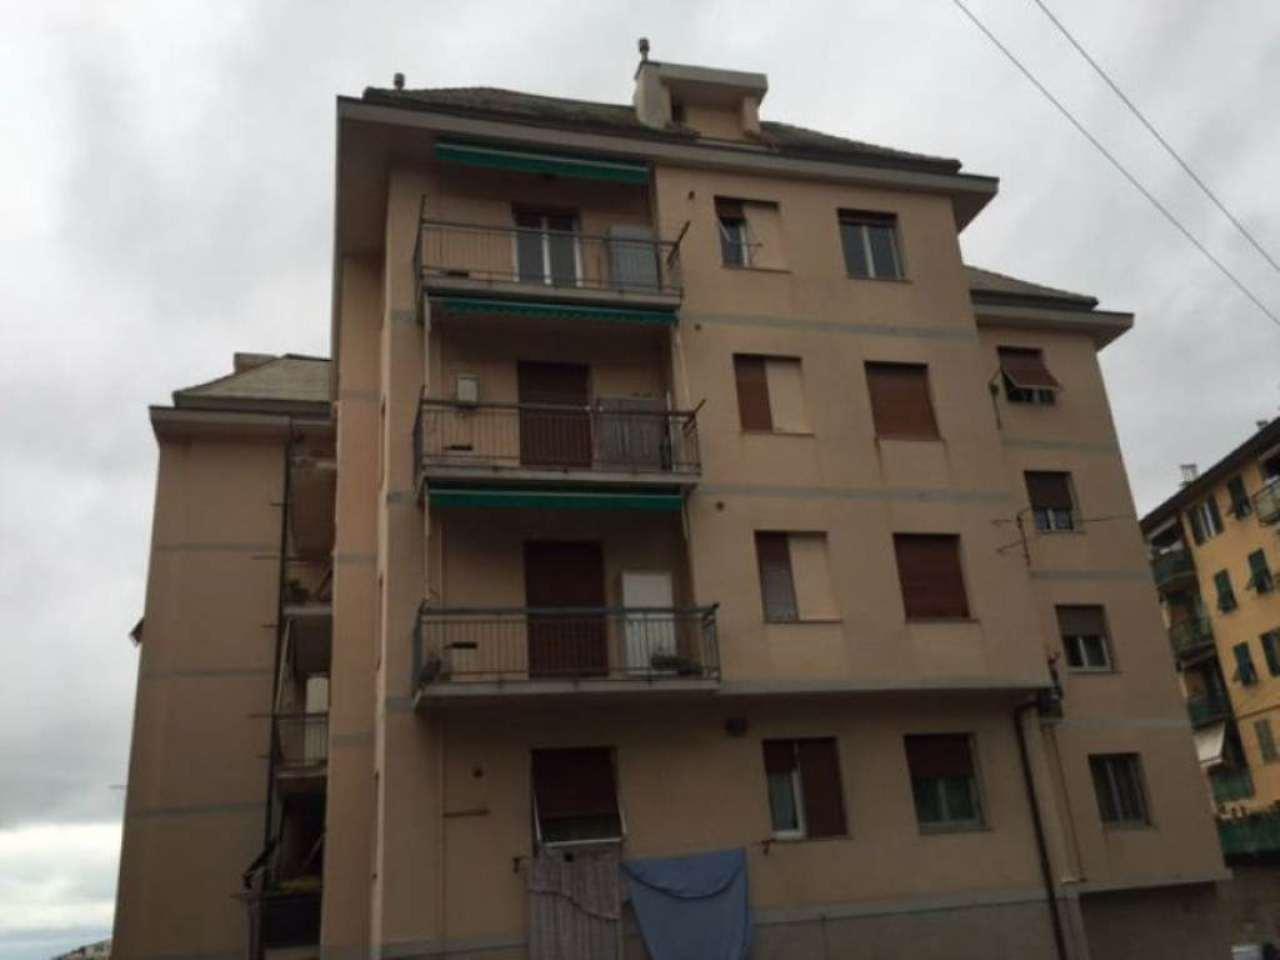 Bilocale Genova Via Berghini 12